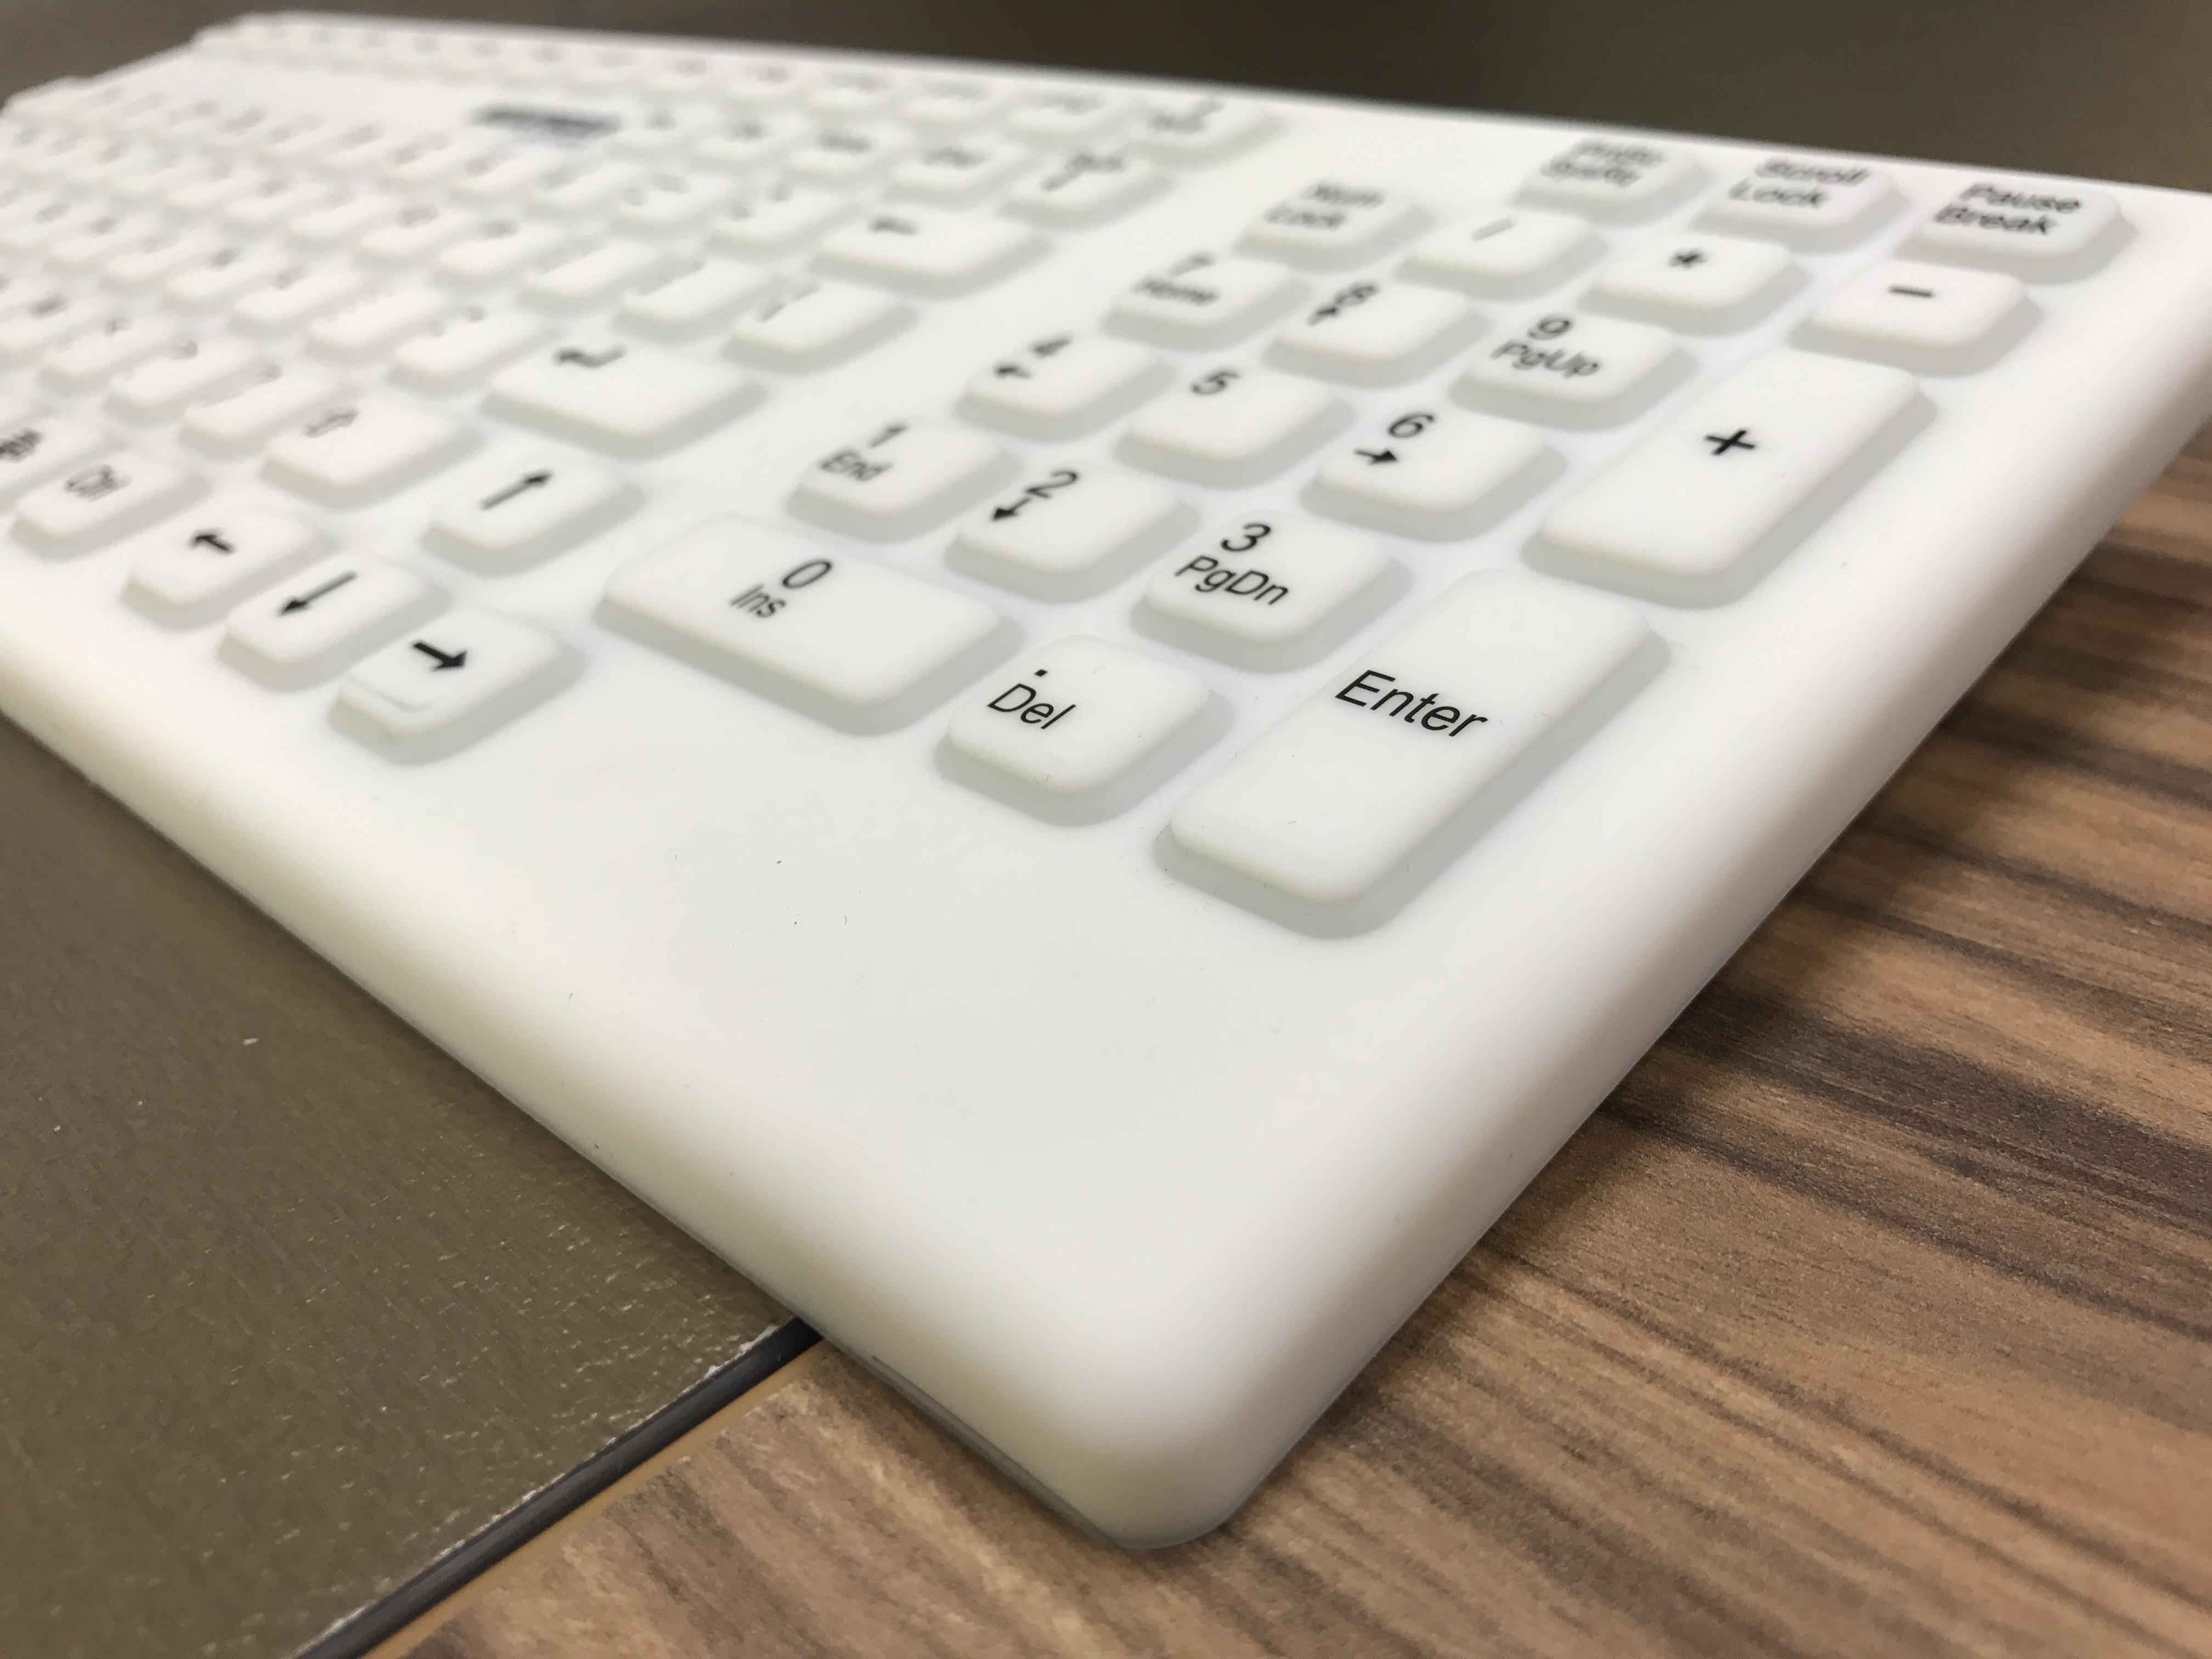 Silicone Tactile Feedback ( Gett )